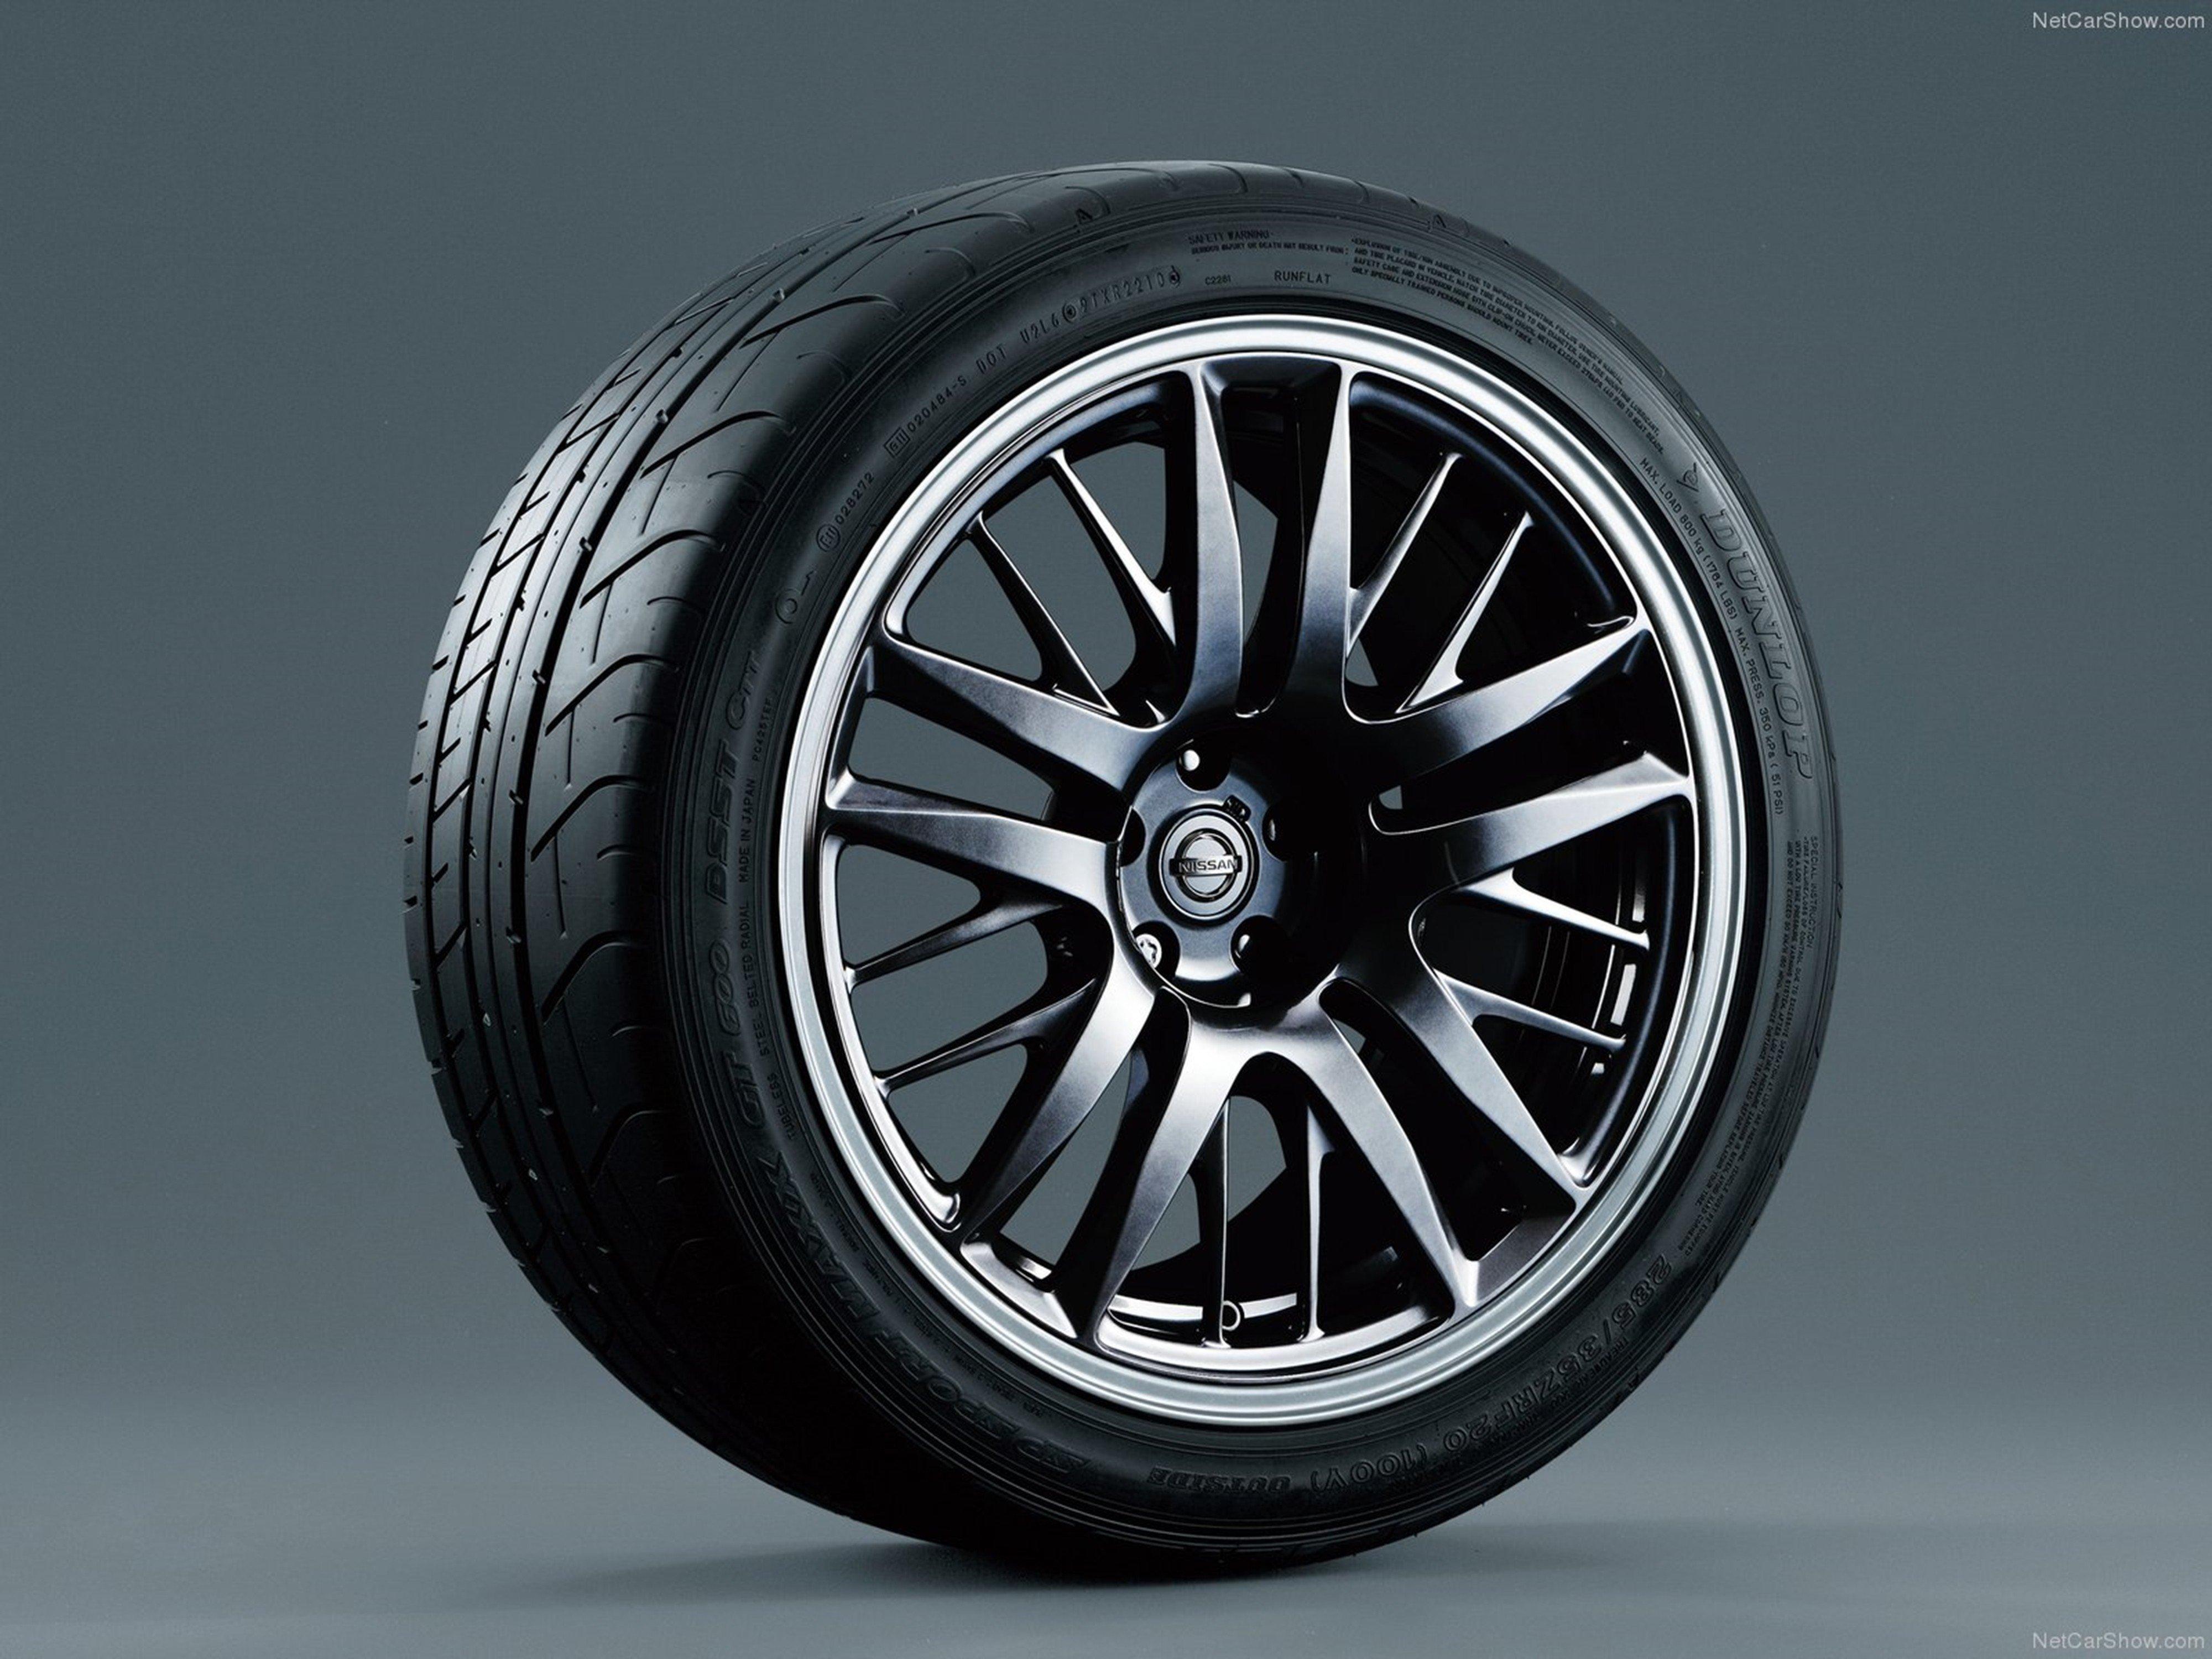 Nissan Sports Car >> Nissan GT-R 2015 supercar car godzilar sports wheel tire wallpaper 83 4000x3000 wallpaper ...